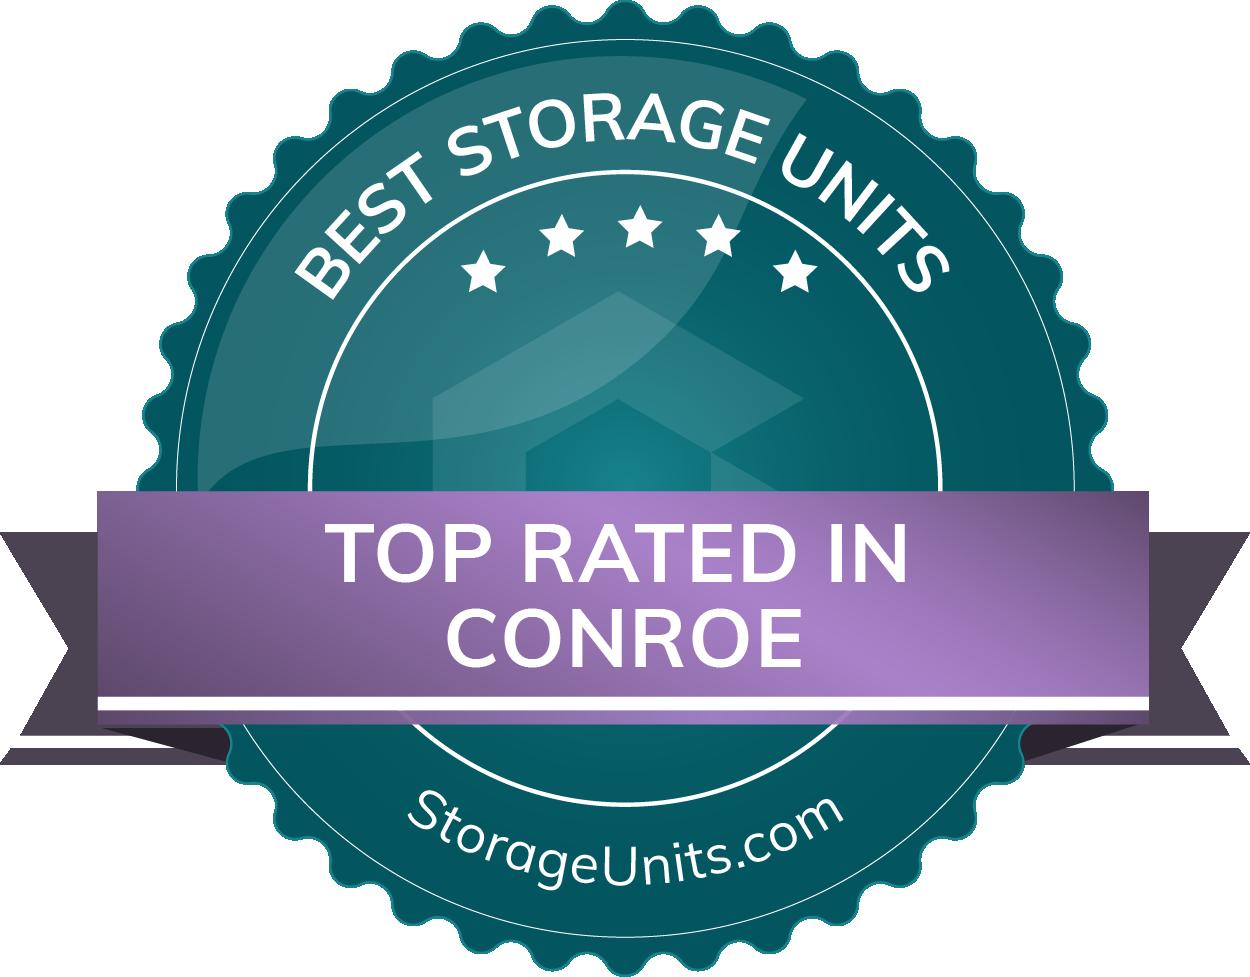 Best Self Storage Units in Conroe, TX